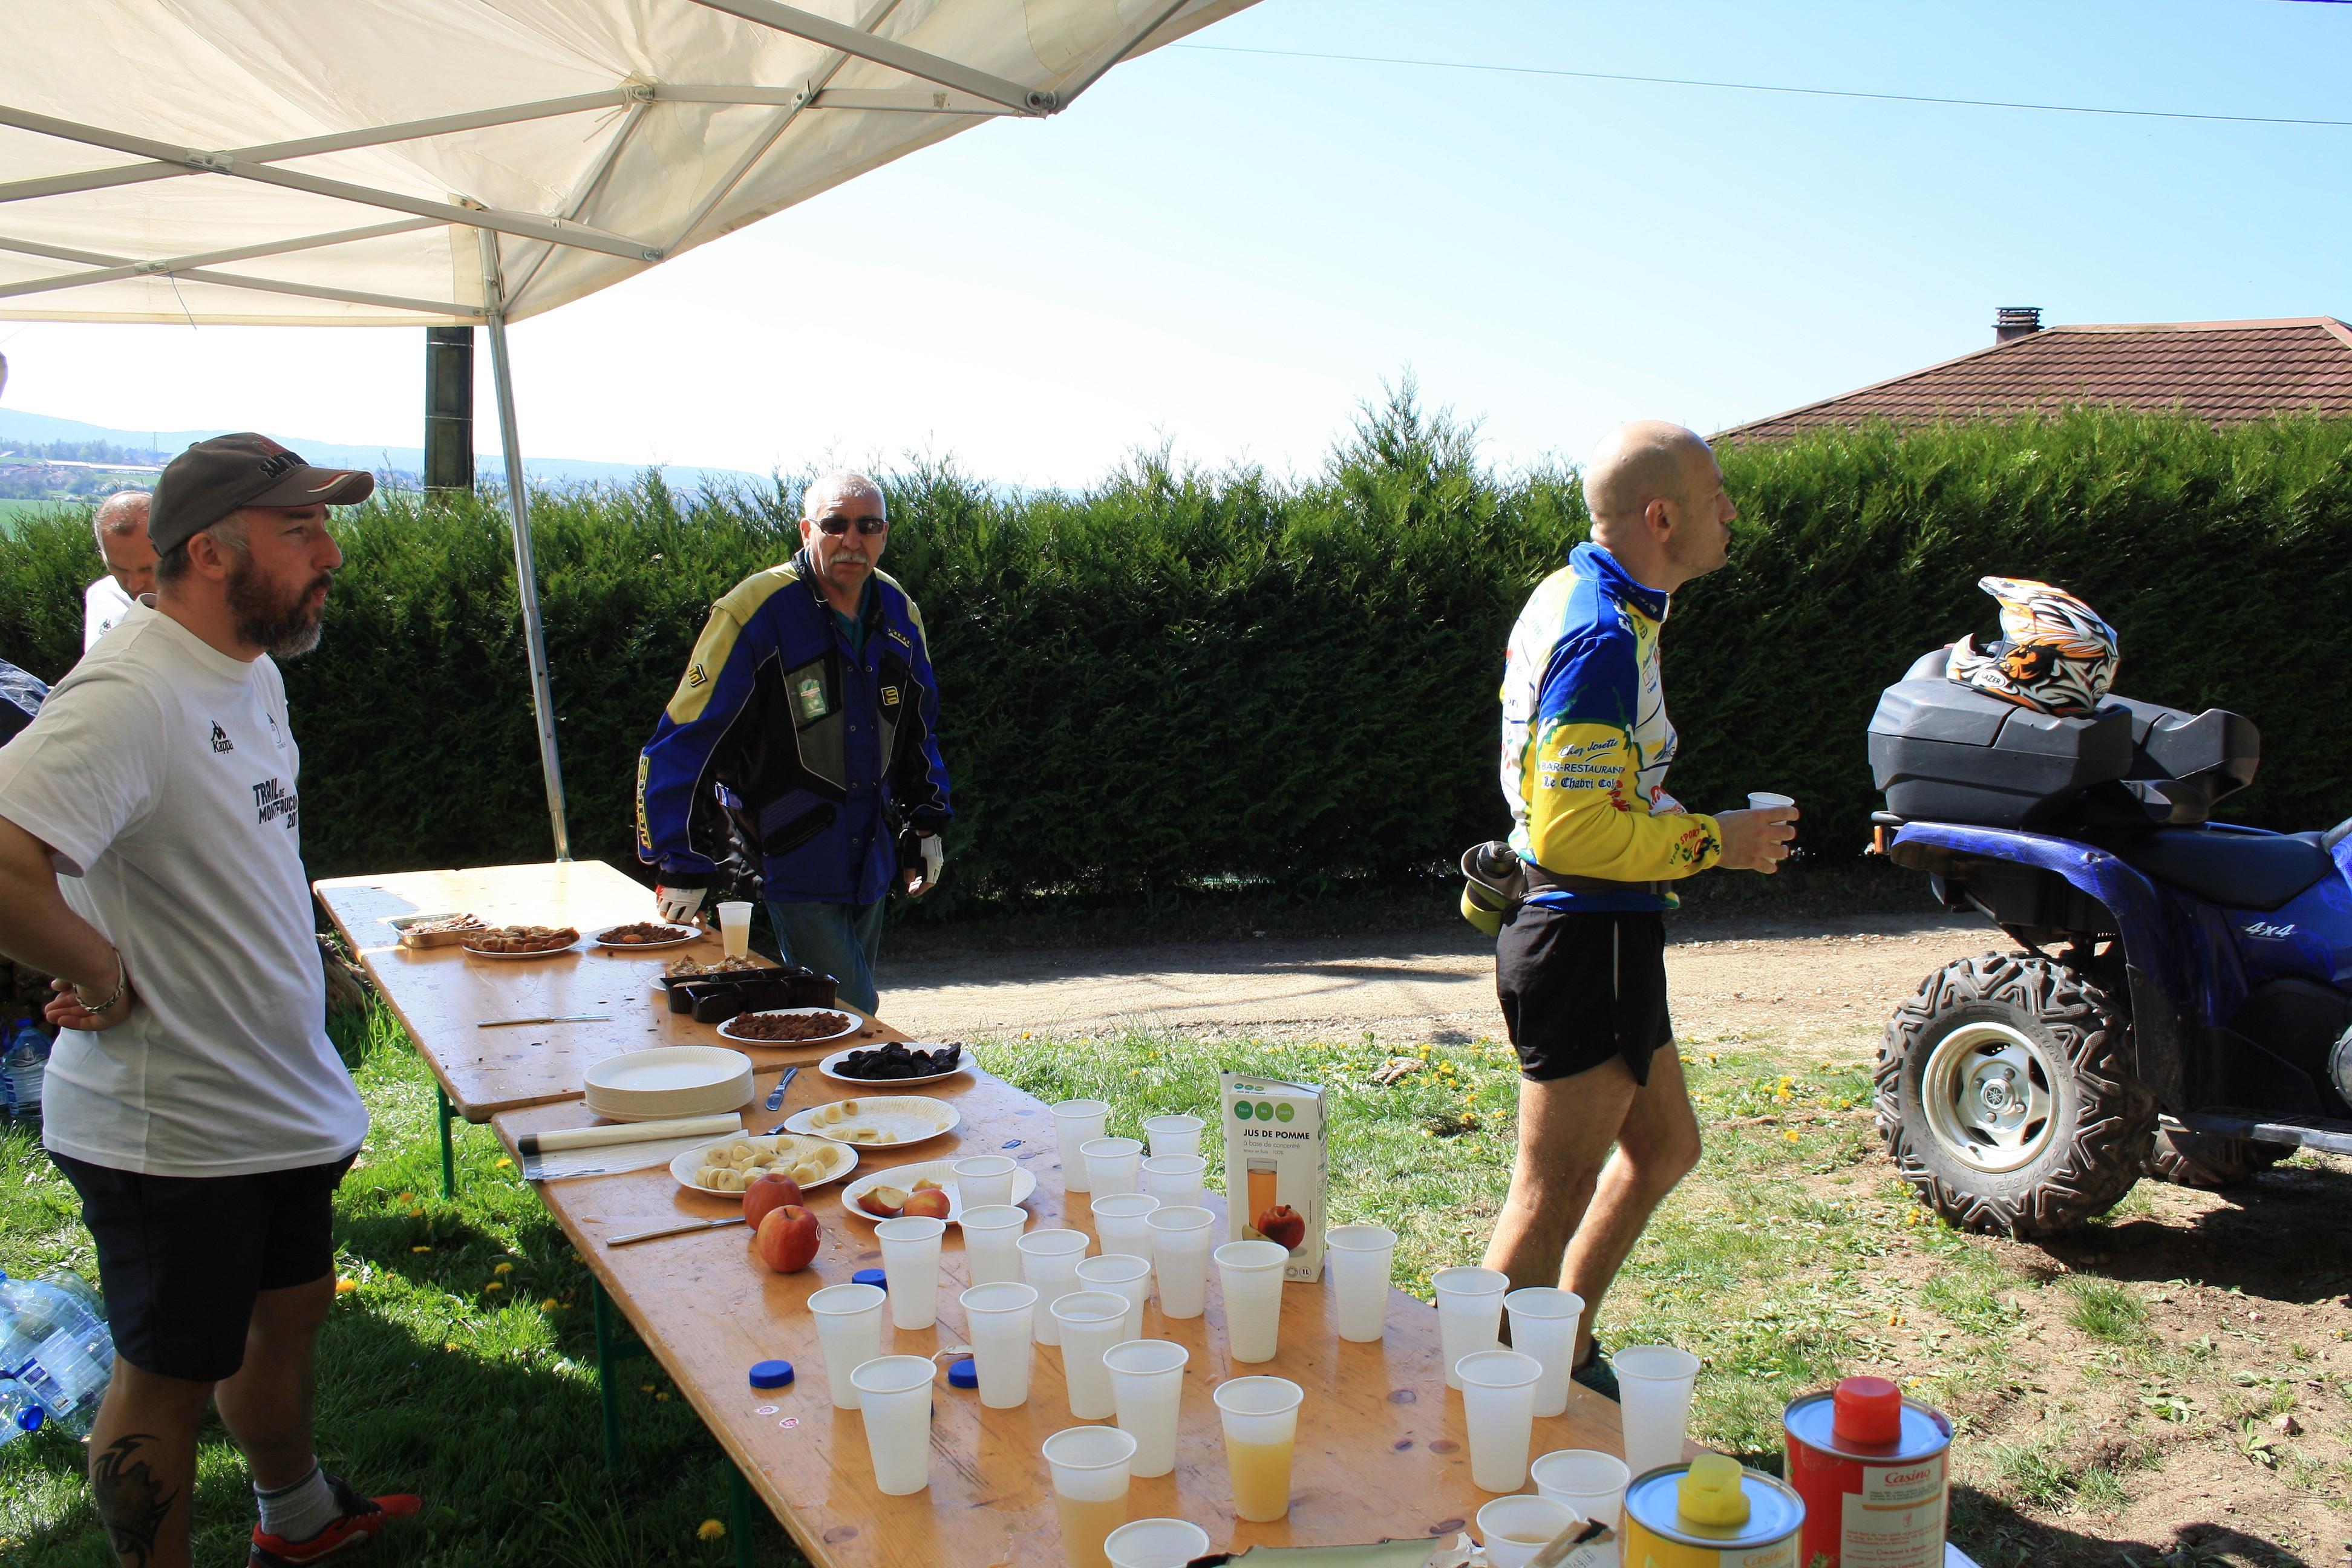 2017-04-09 - Trail-Montfaucon (322)